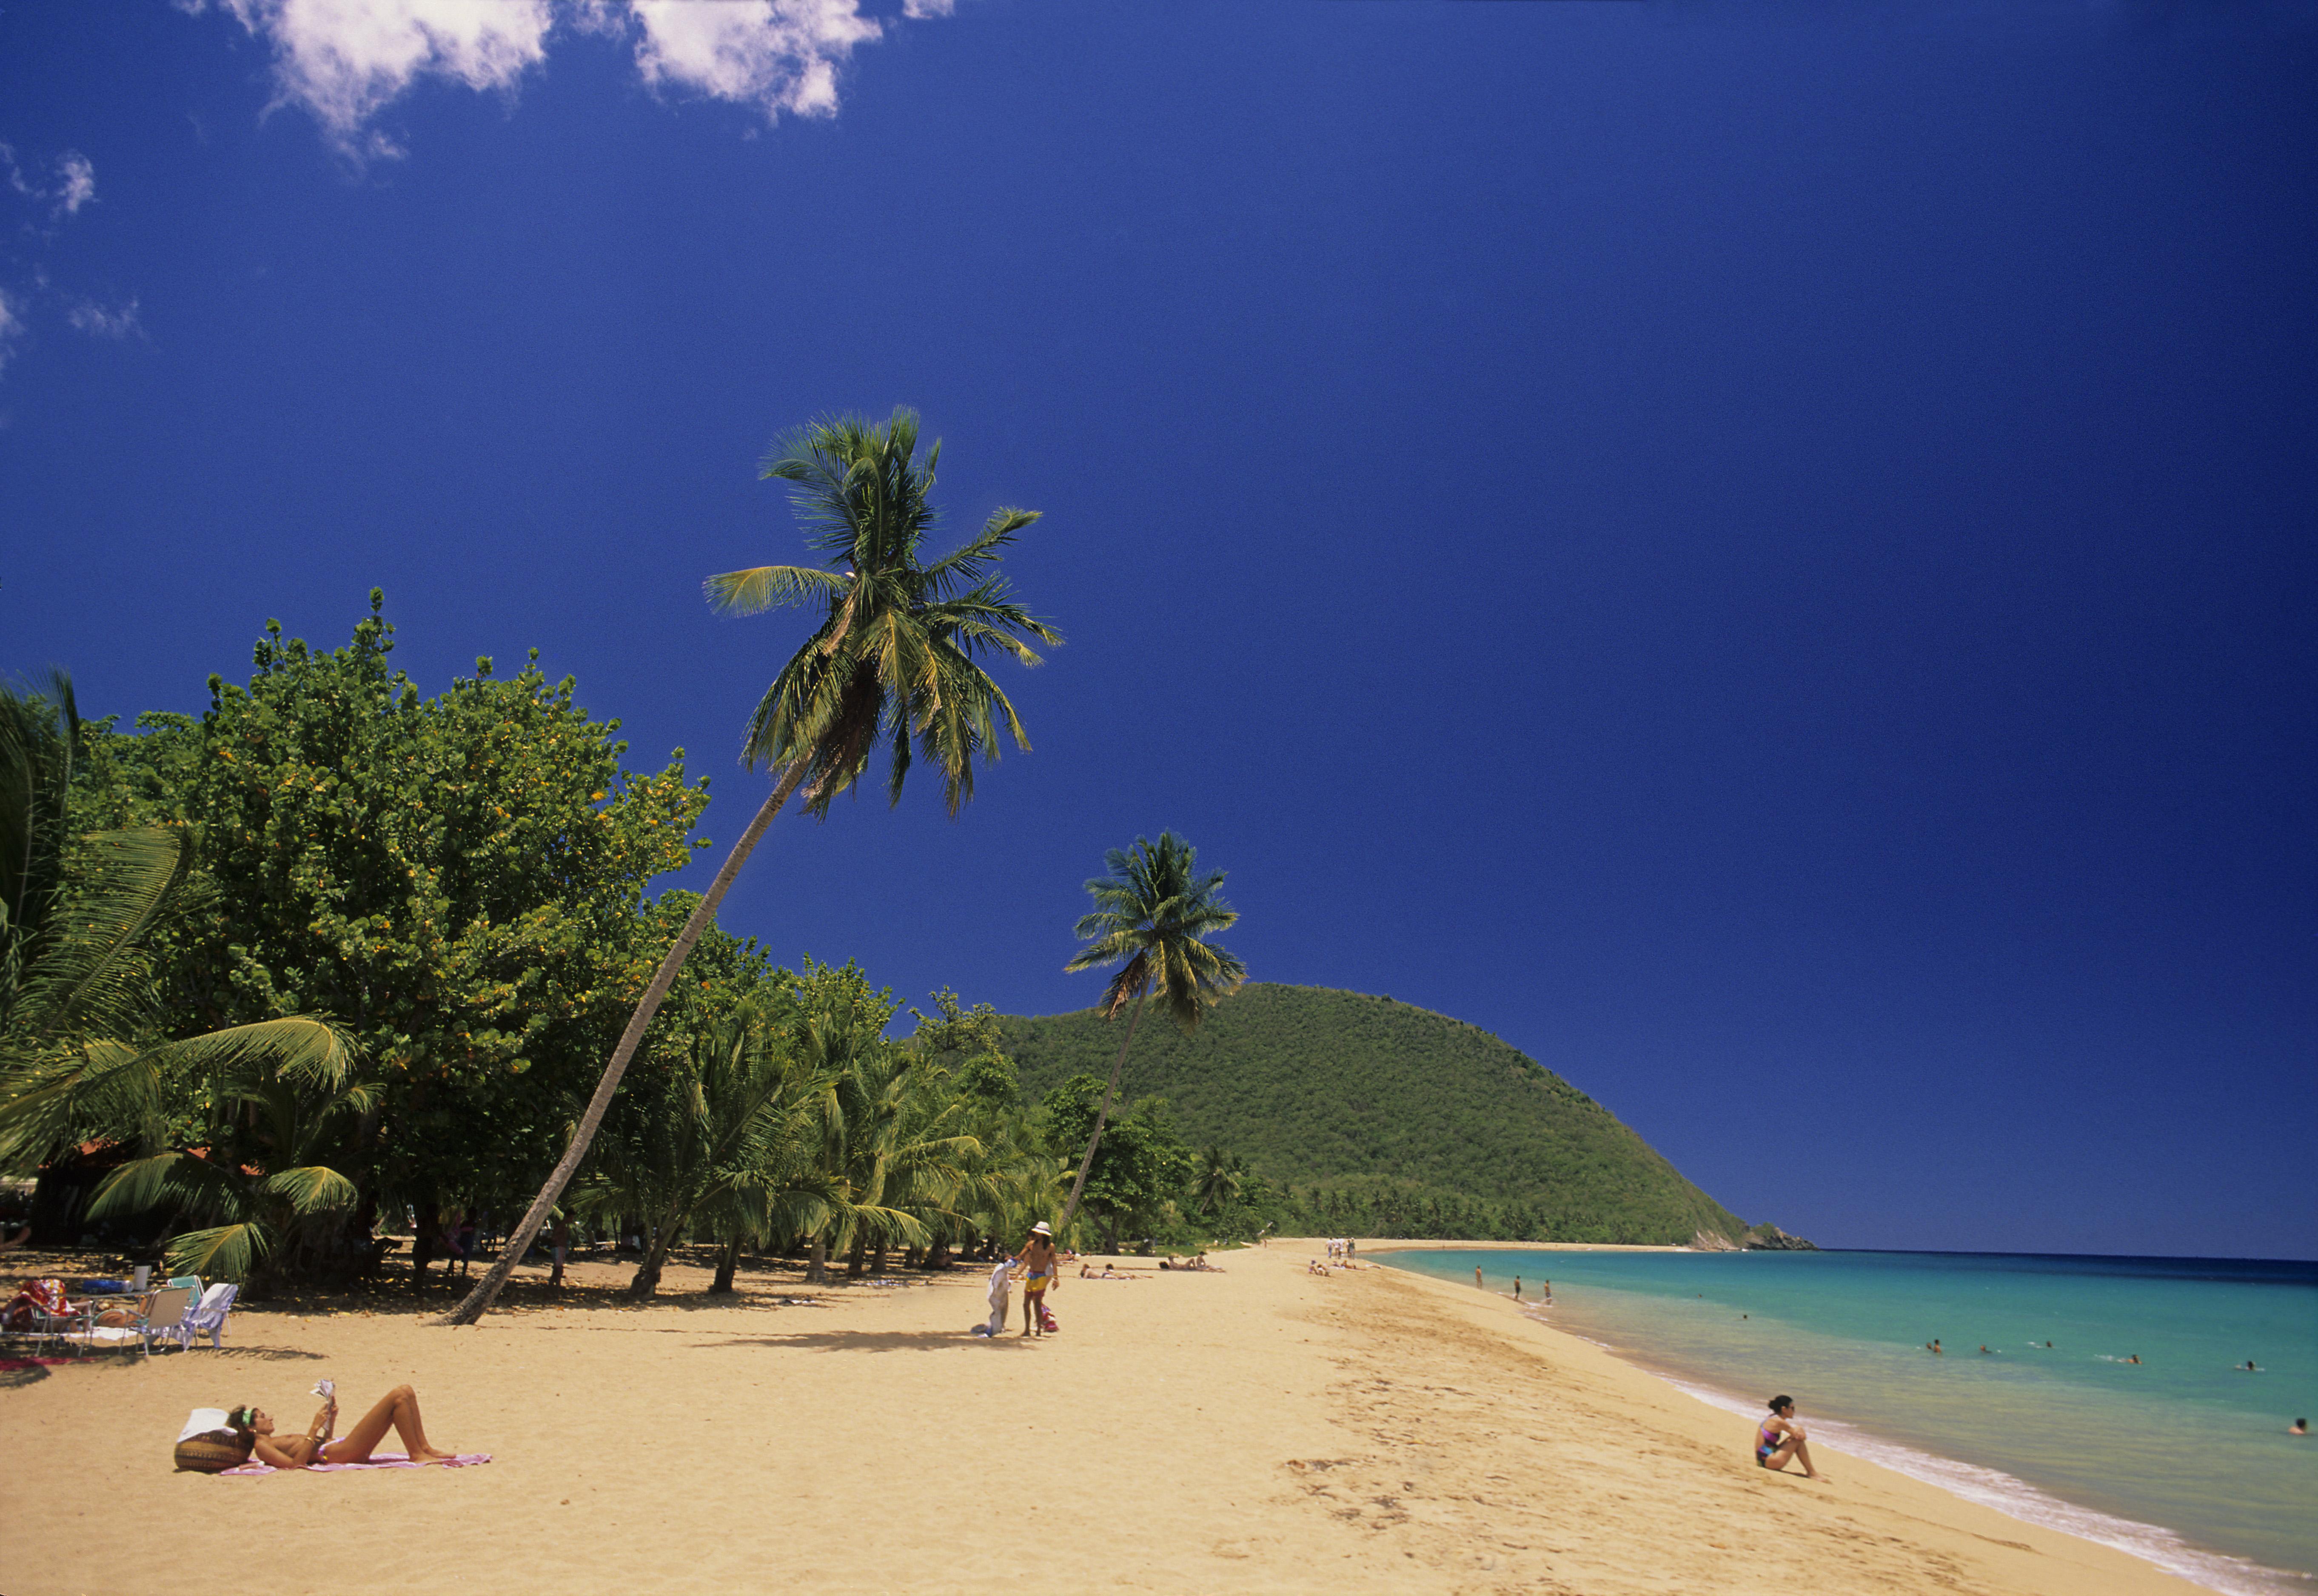 Plage de Grande Anse - Deshaie